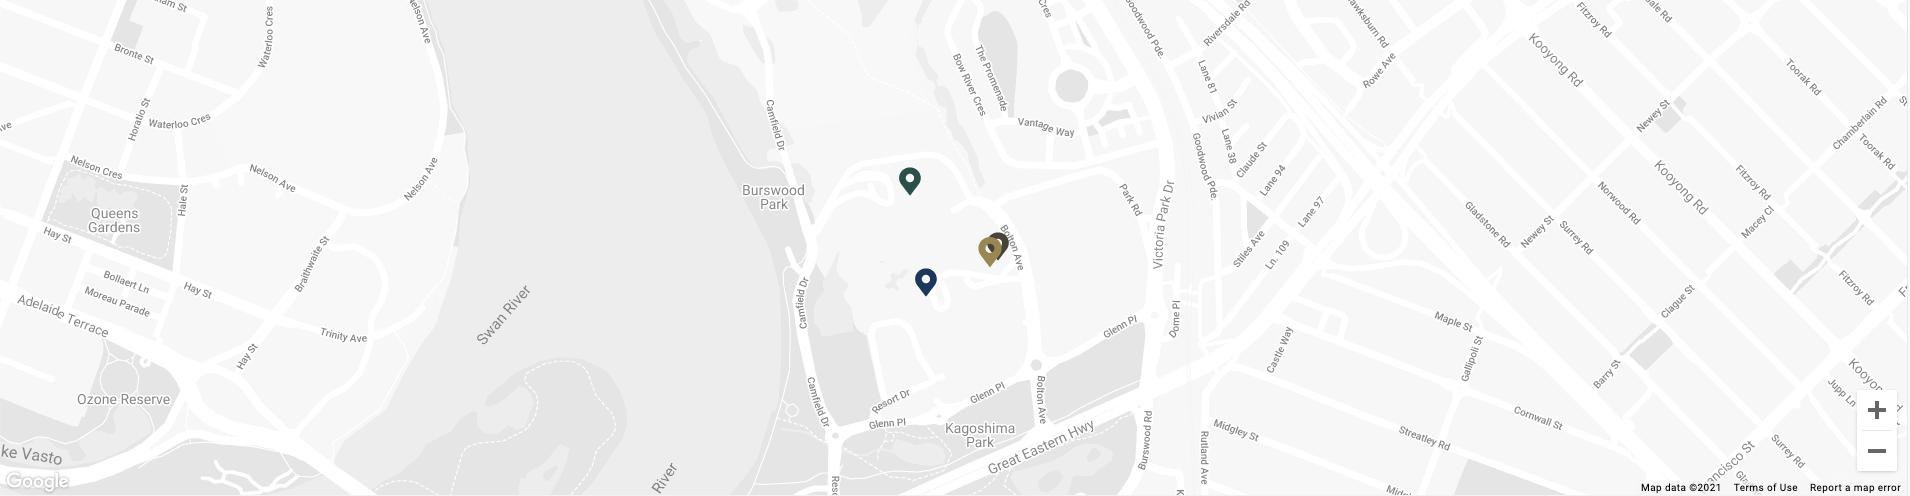 Map image of Market & Co